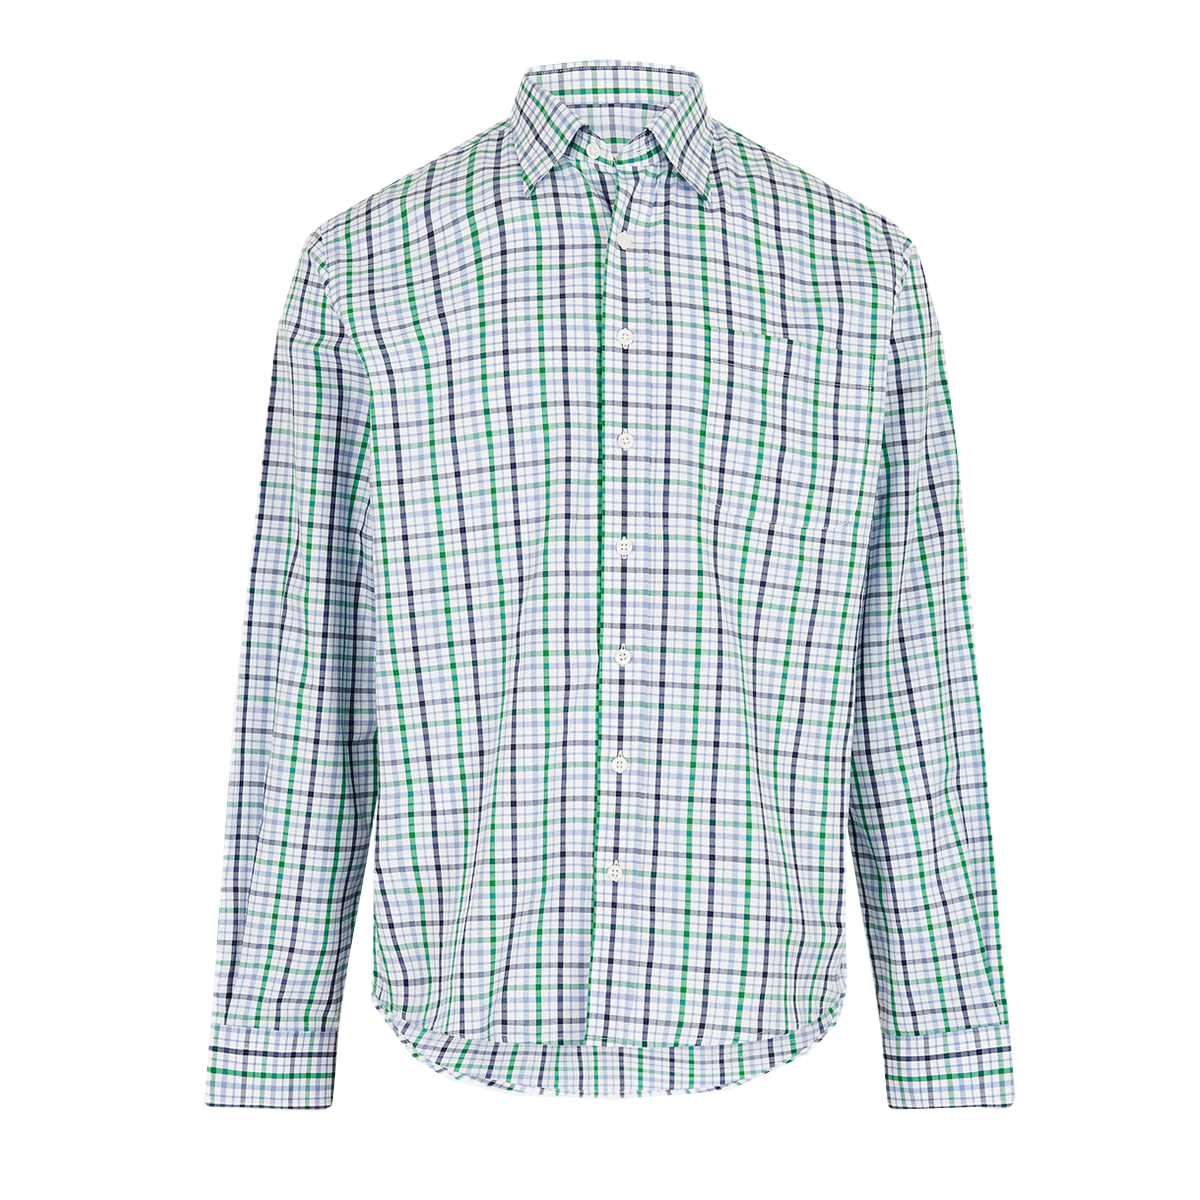 Dubarry-Rathdrum-Check-Shirt–Kelly-Green